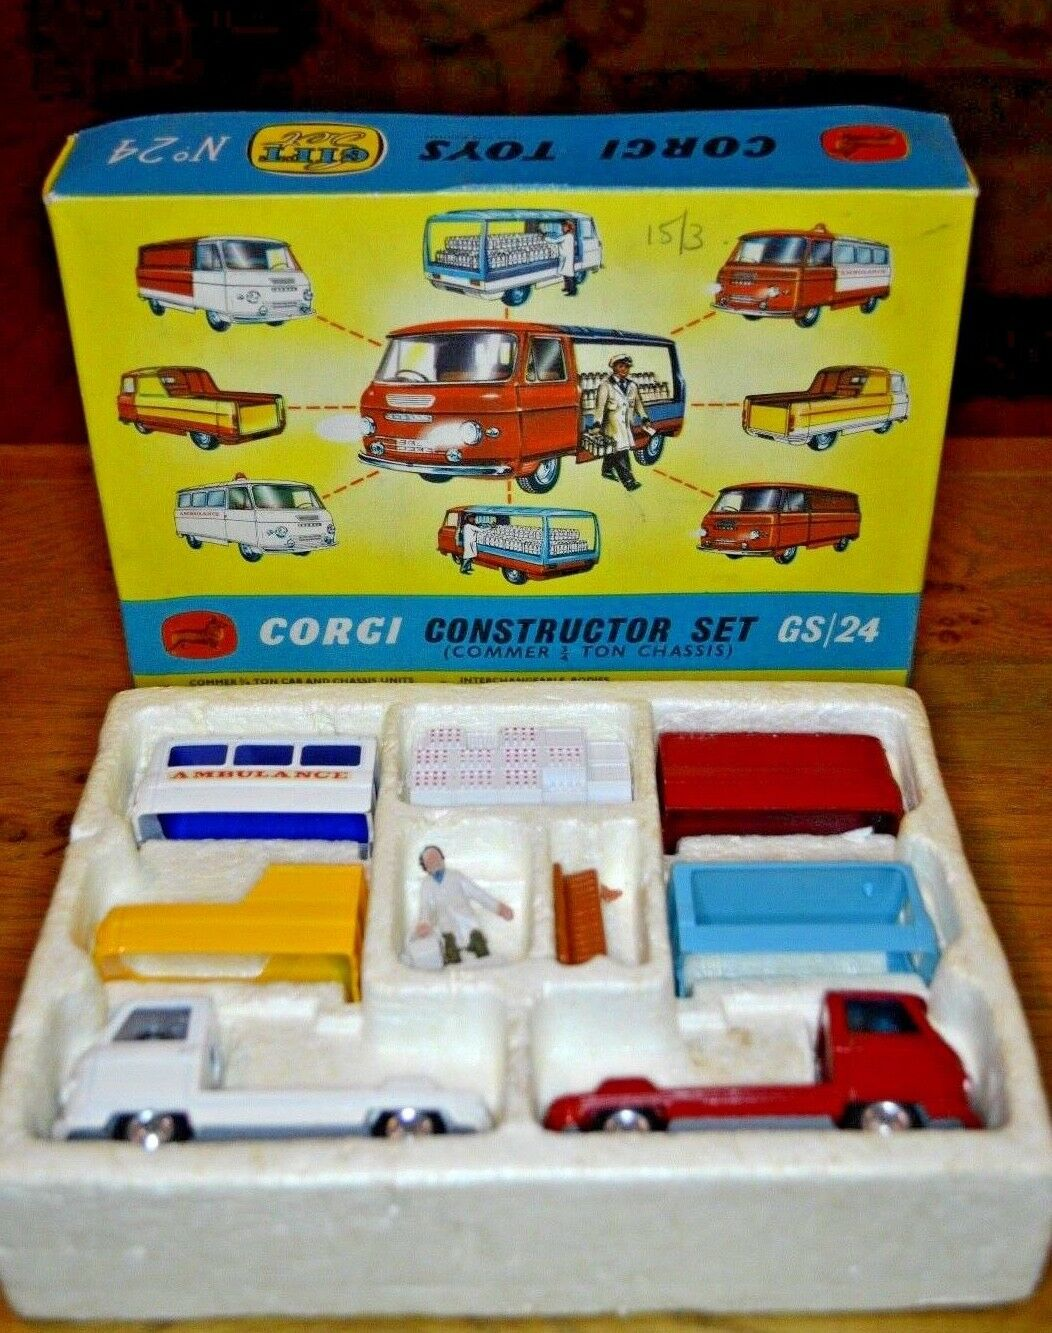 VINTAGE CORGI TOYS Gift Set No.24 costruttore serie; tutto originale originale originale 36f9b2